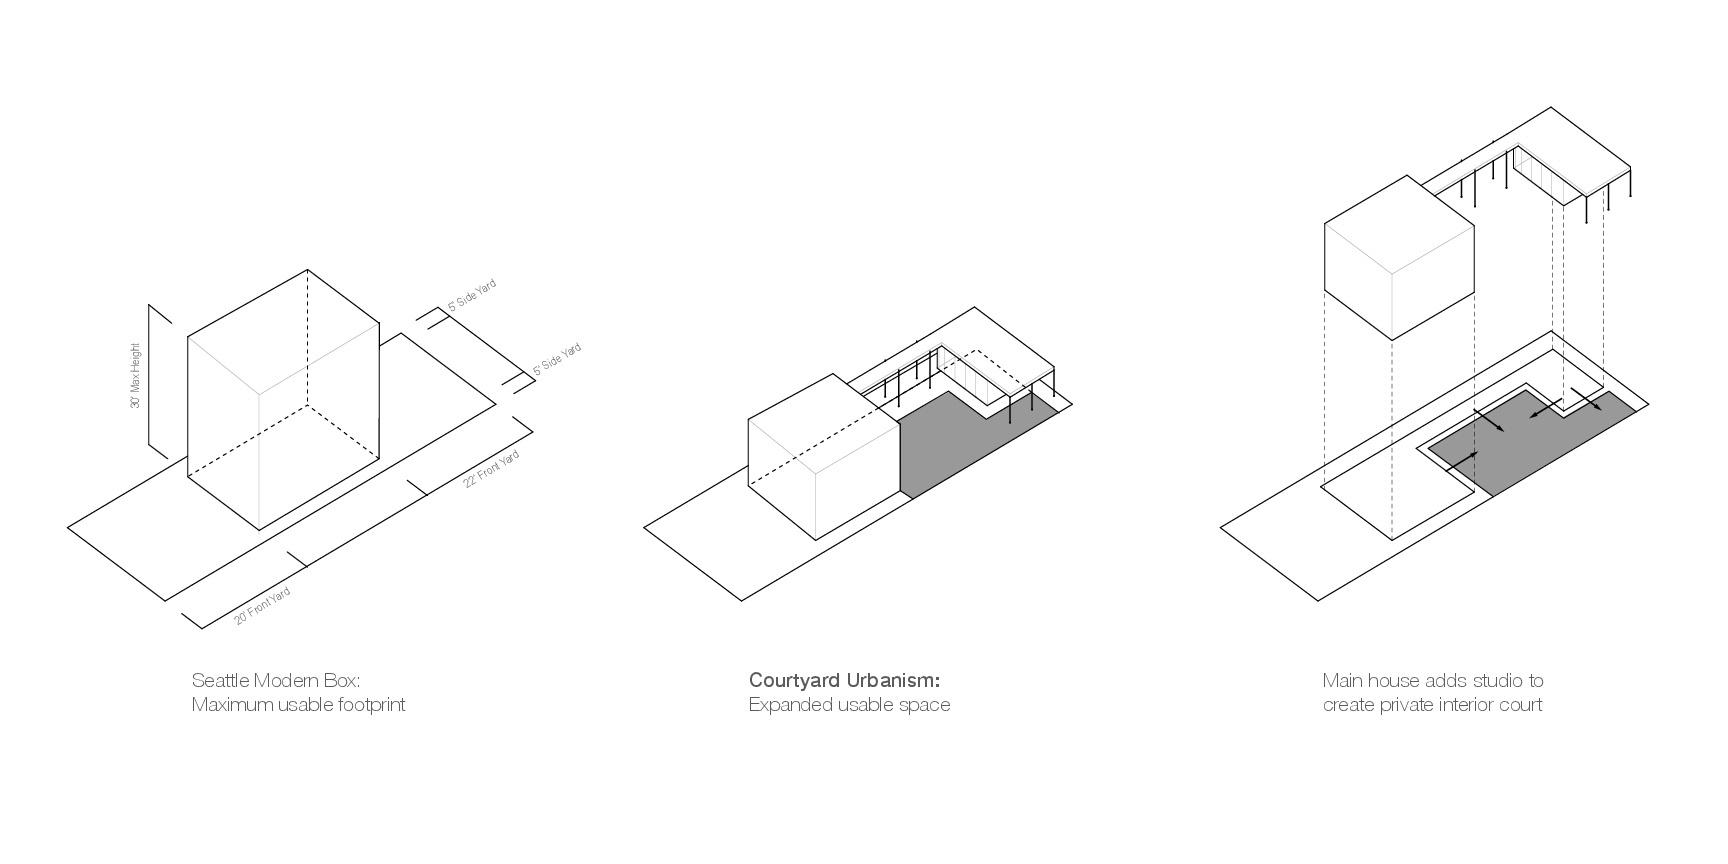 grasshopper studio and courtyard wittman estes concept diagram [ 1728 x 864 Pixel ]